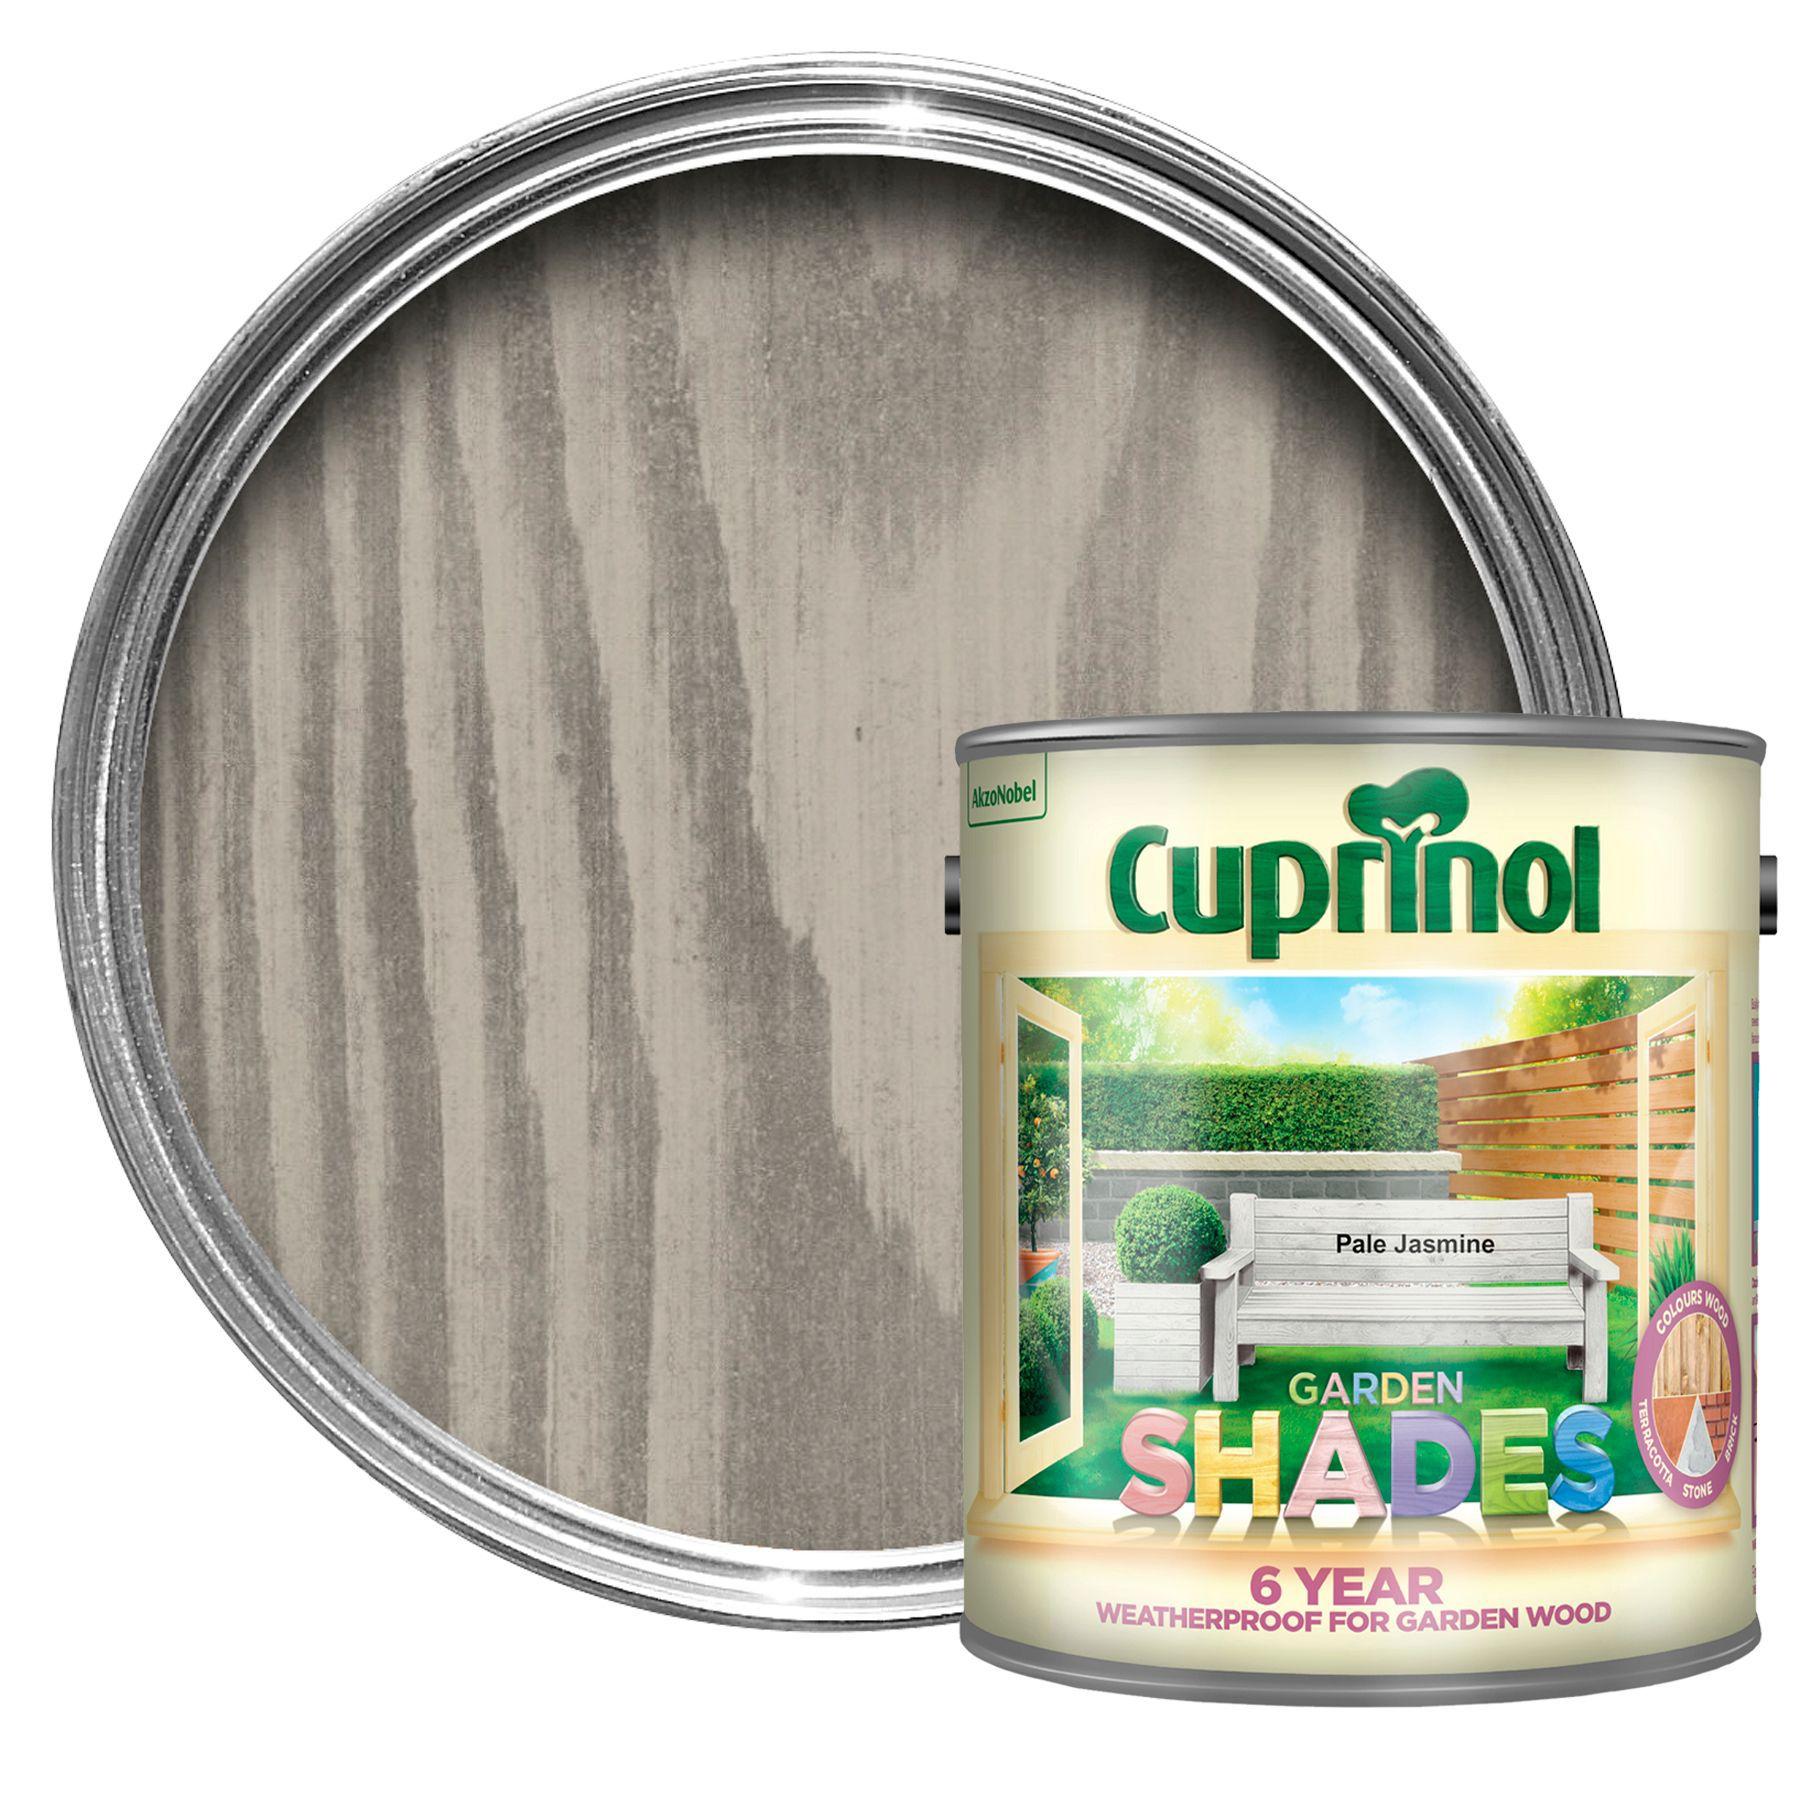 Cuprinol Garden Shades Pale Jasmine Matt Wood Paint 2 5l Departments Diy At B Q